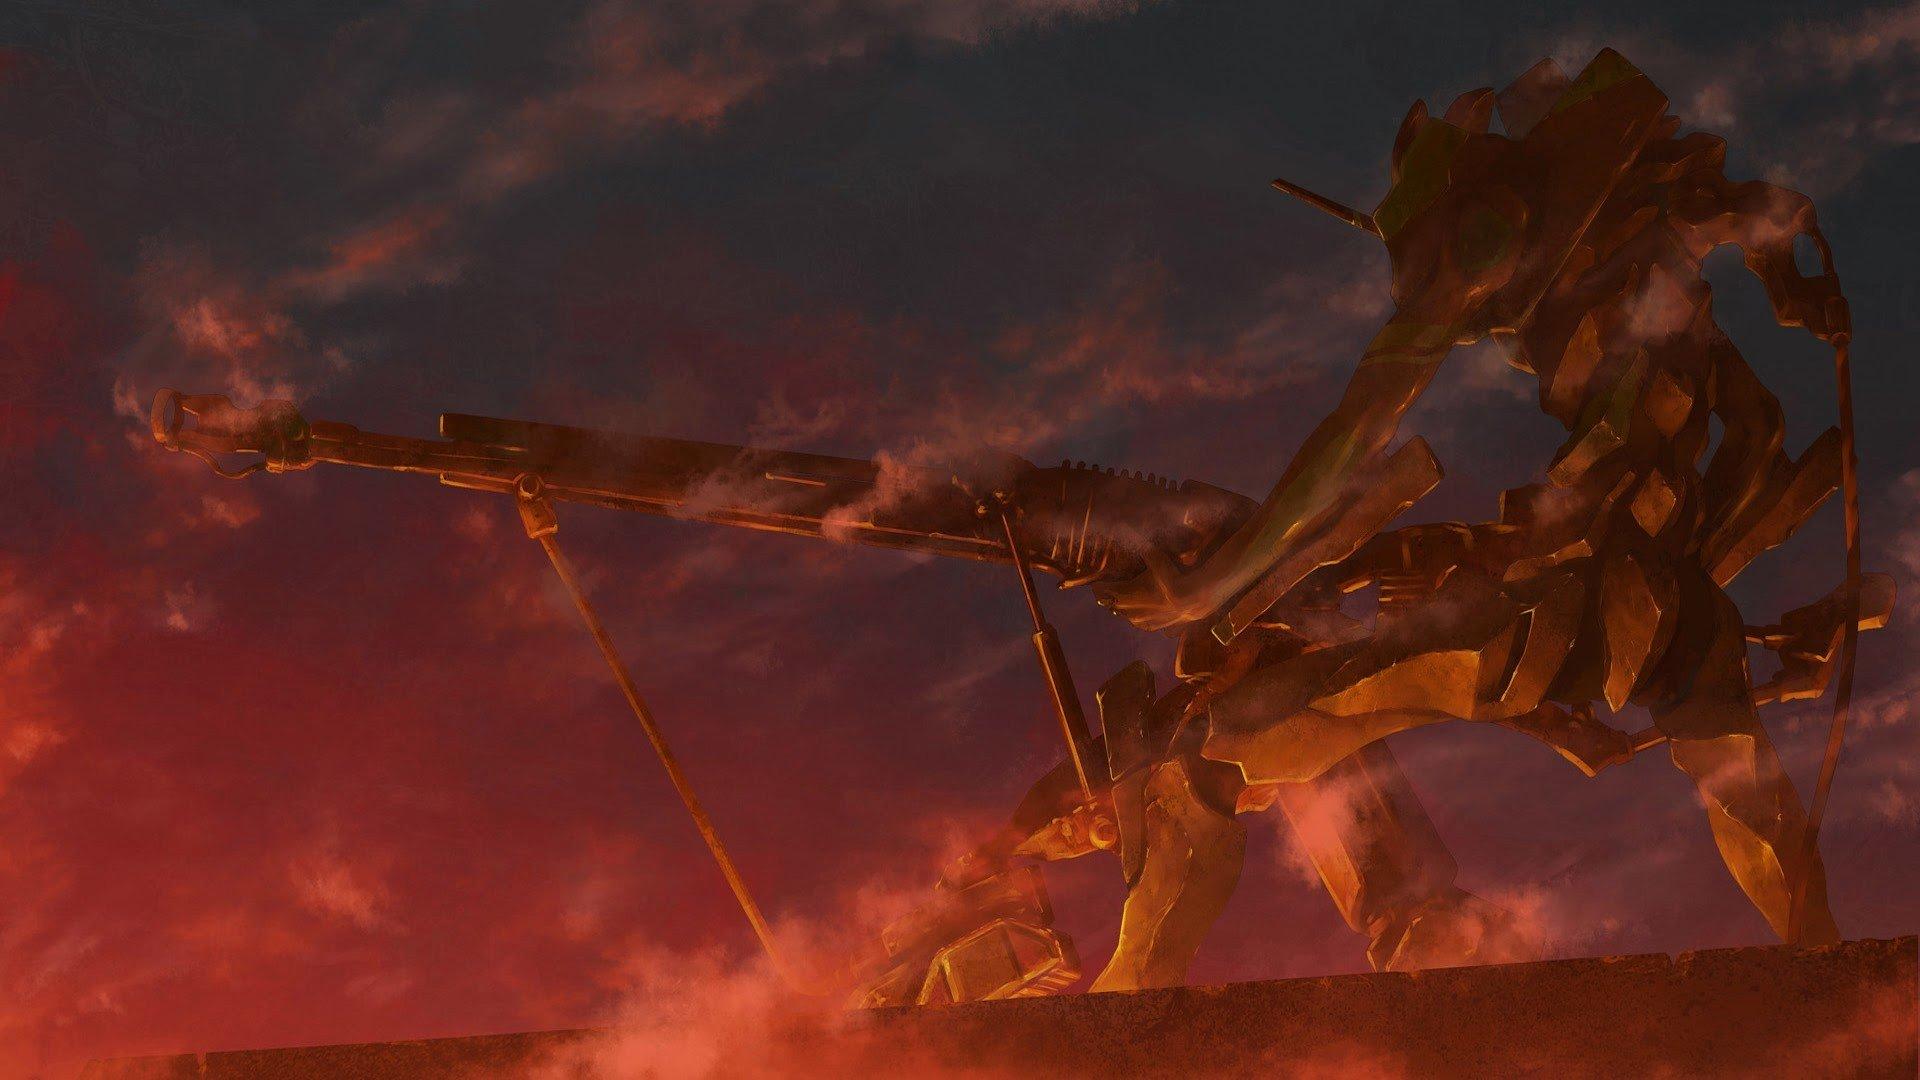 Neon Genesis Evangelion Eva Unit 01 Anime Hd Wallpapers